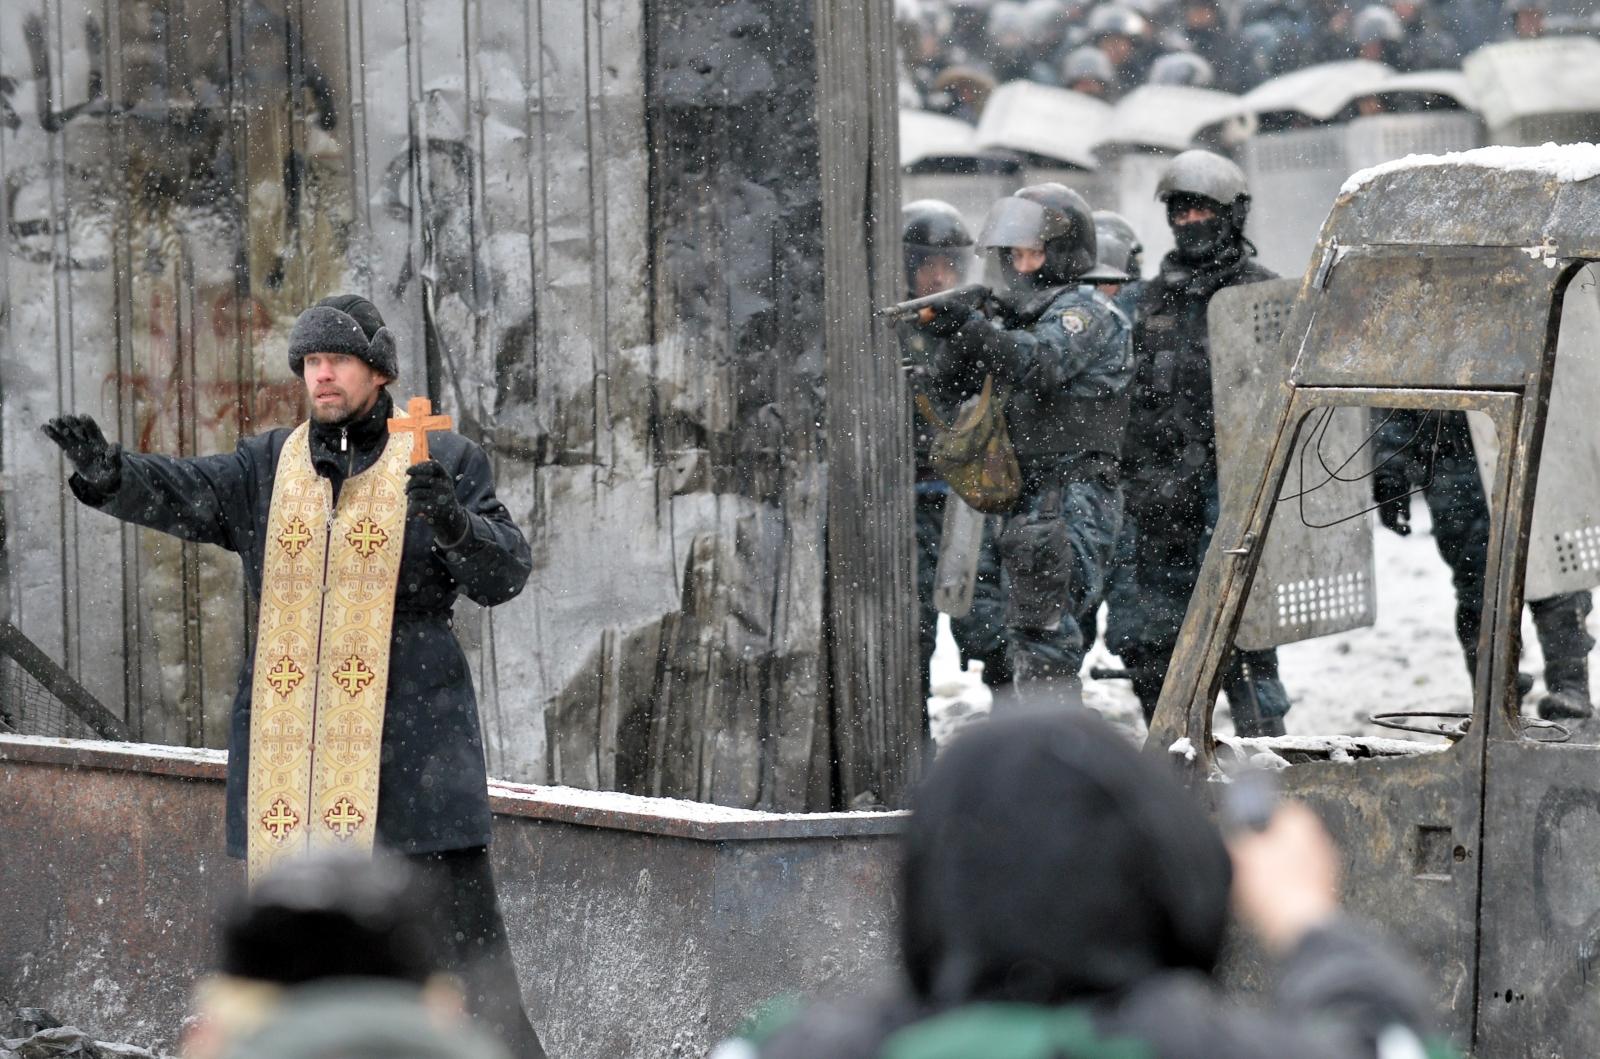 Ukraine Orthodox Priest Kiev Protest Violence War